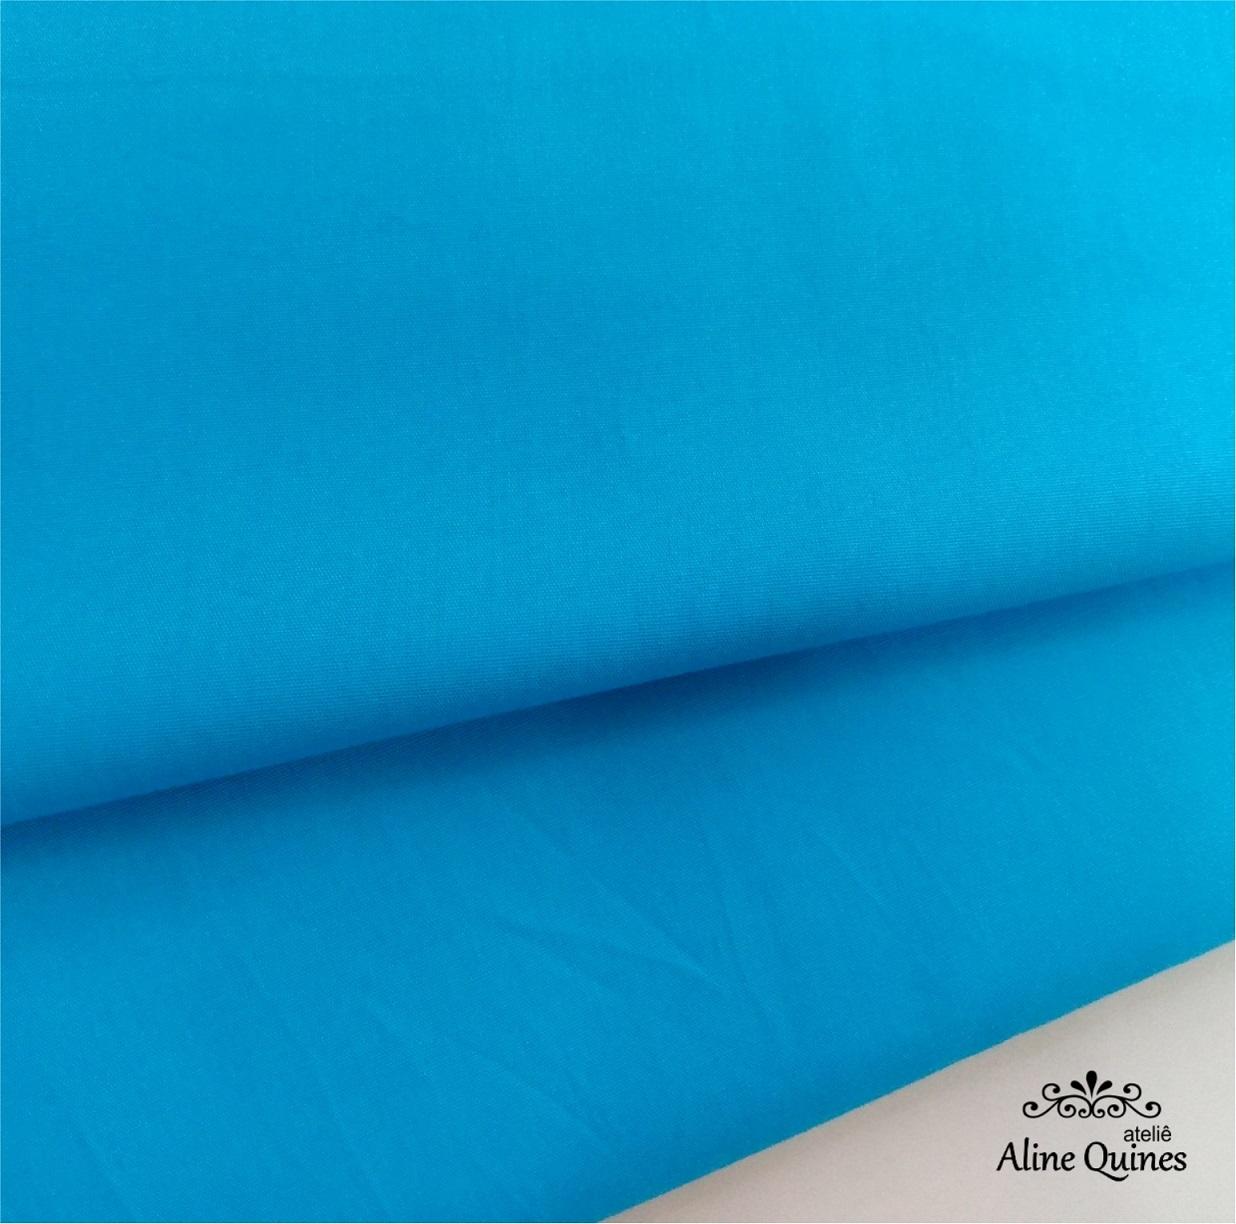 FERNANDO MALUHY - Tecido Azul Turquesa Liso - 25cm X 150cm - Tricoline